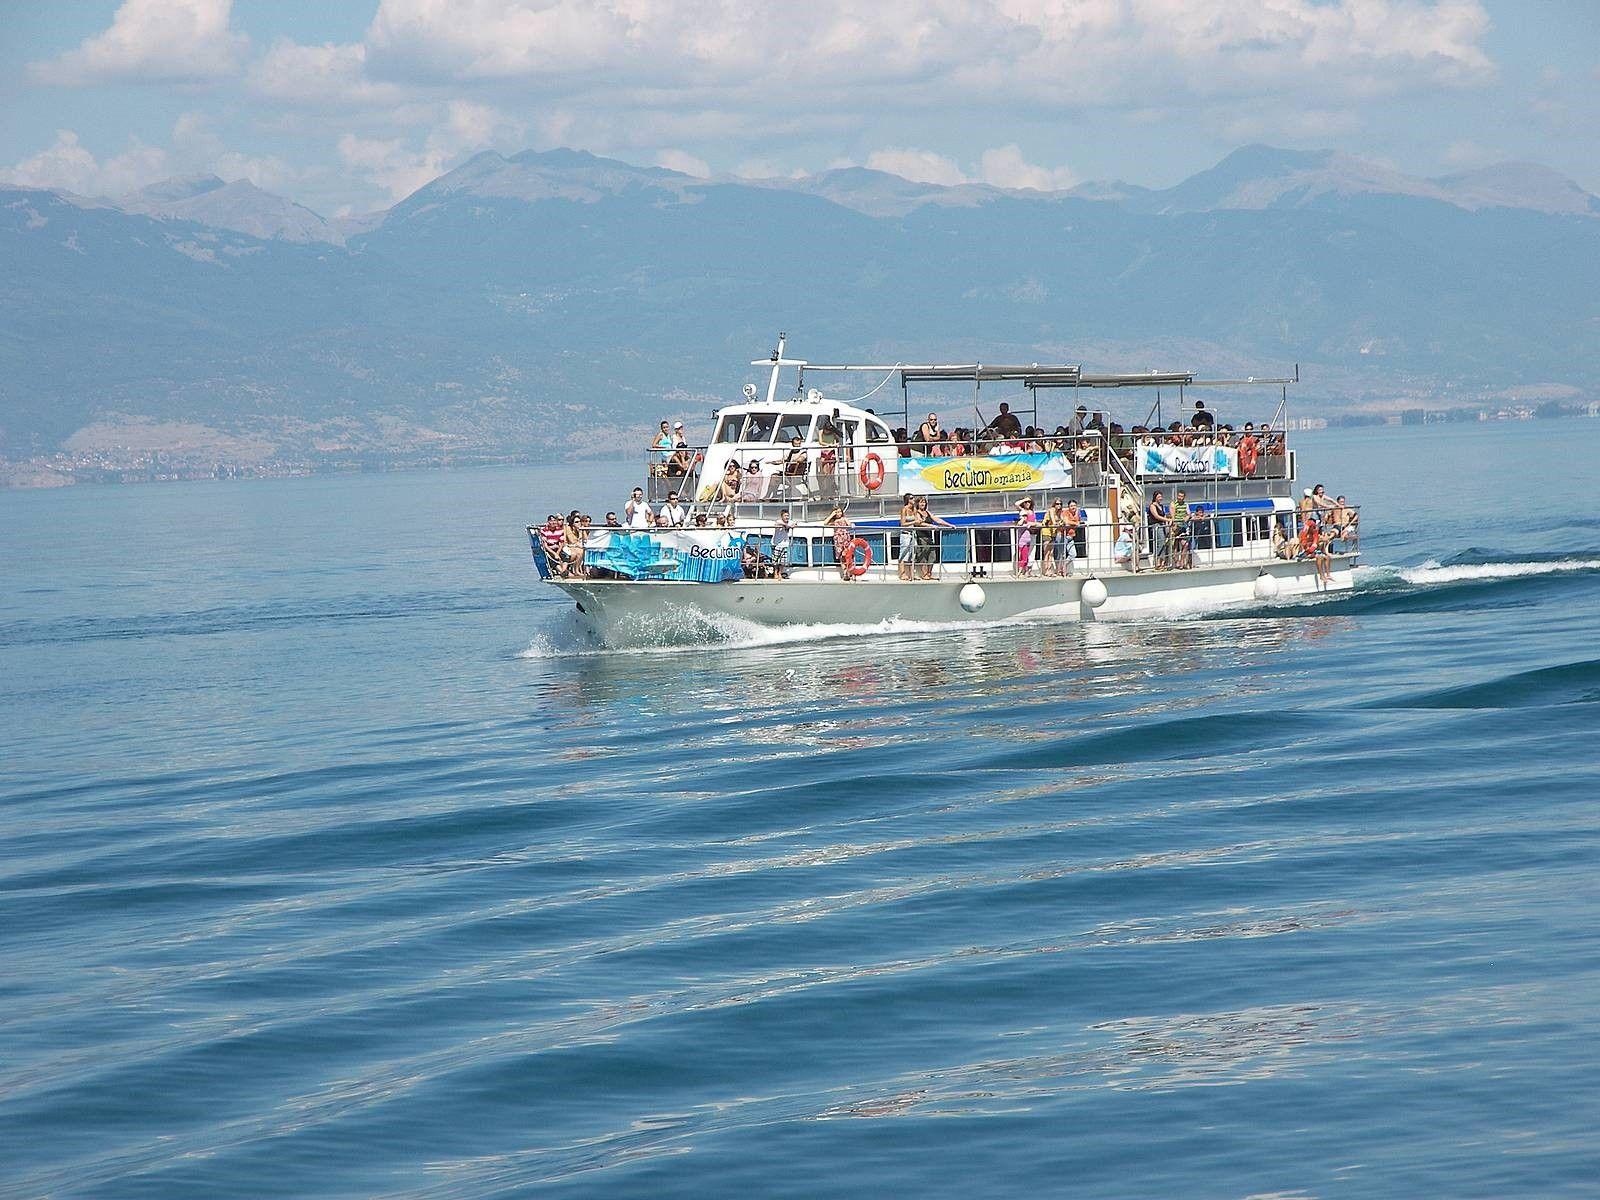 OHRID SPRING BREAK - First minute: Izlet brodom po Ohridskom jezeru